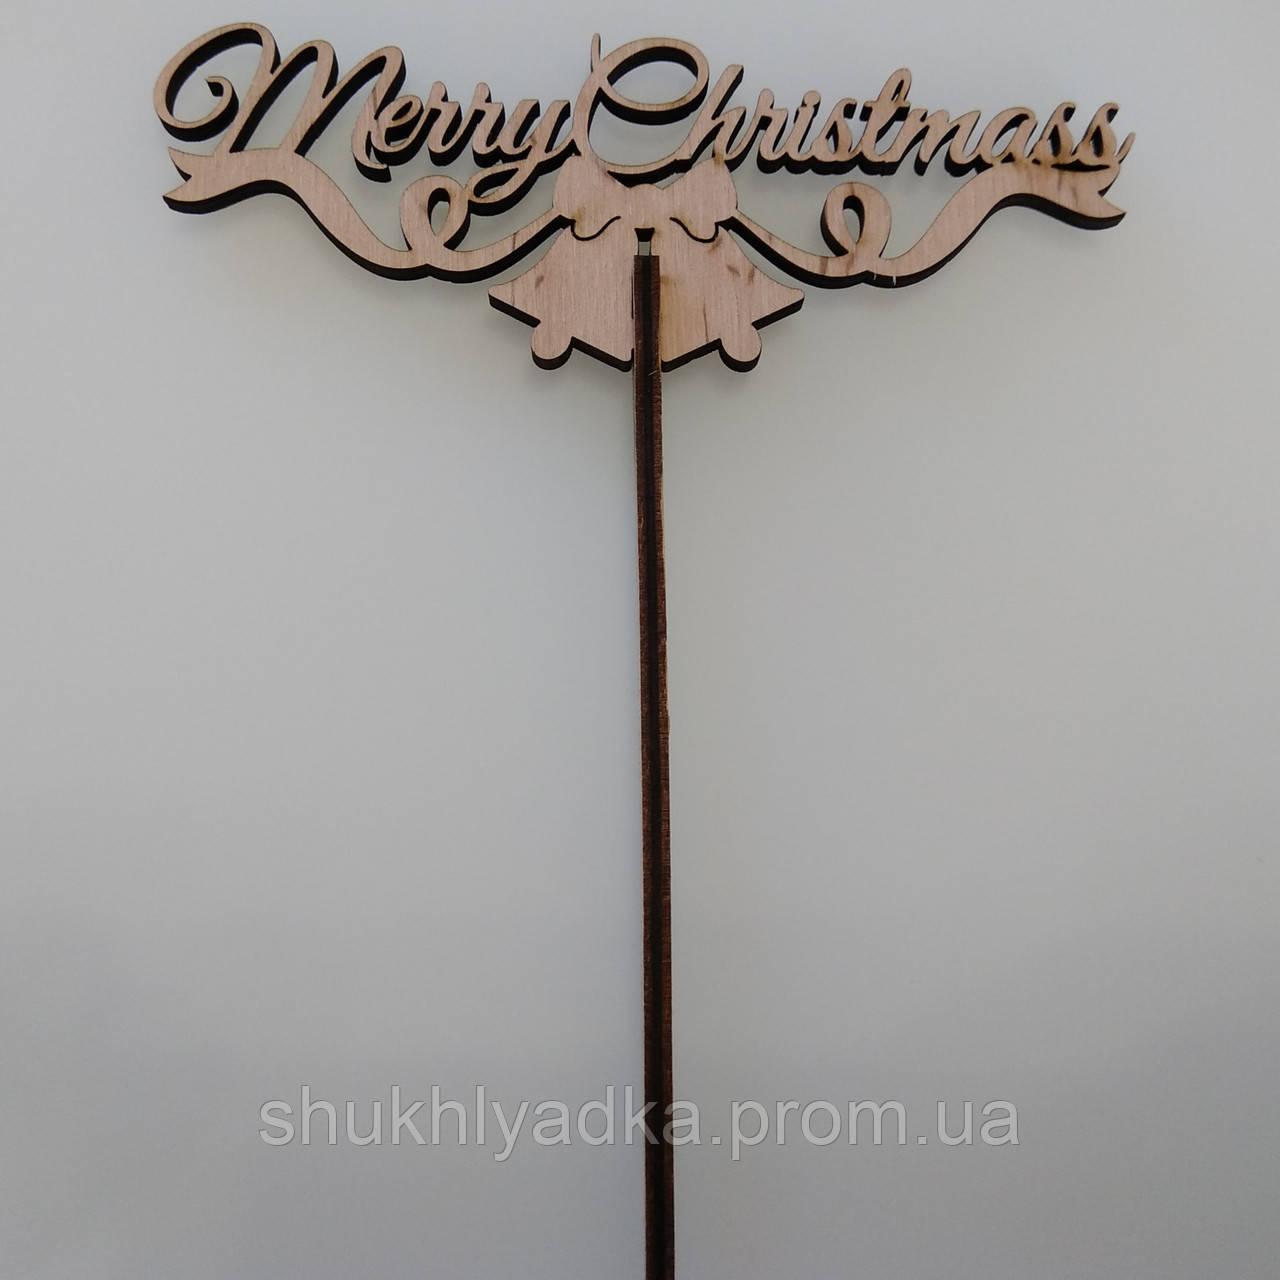 Merry Christmas_колокольчки